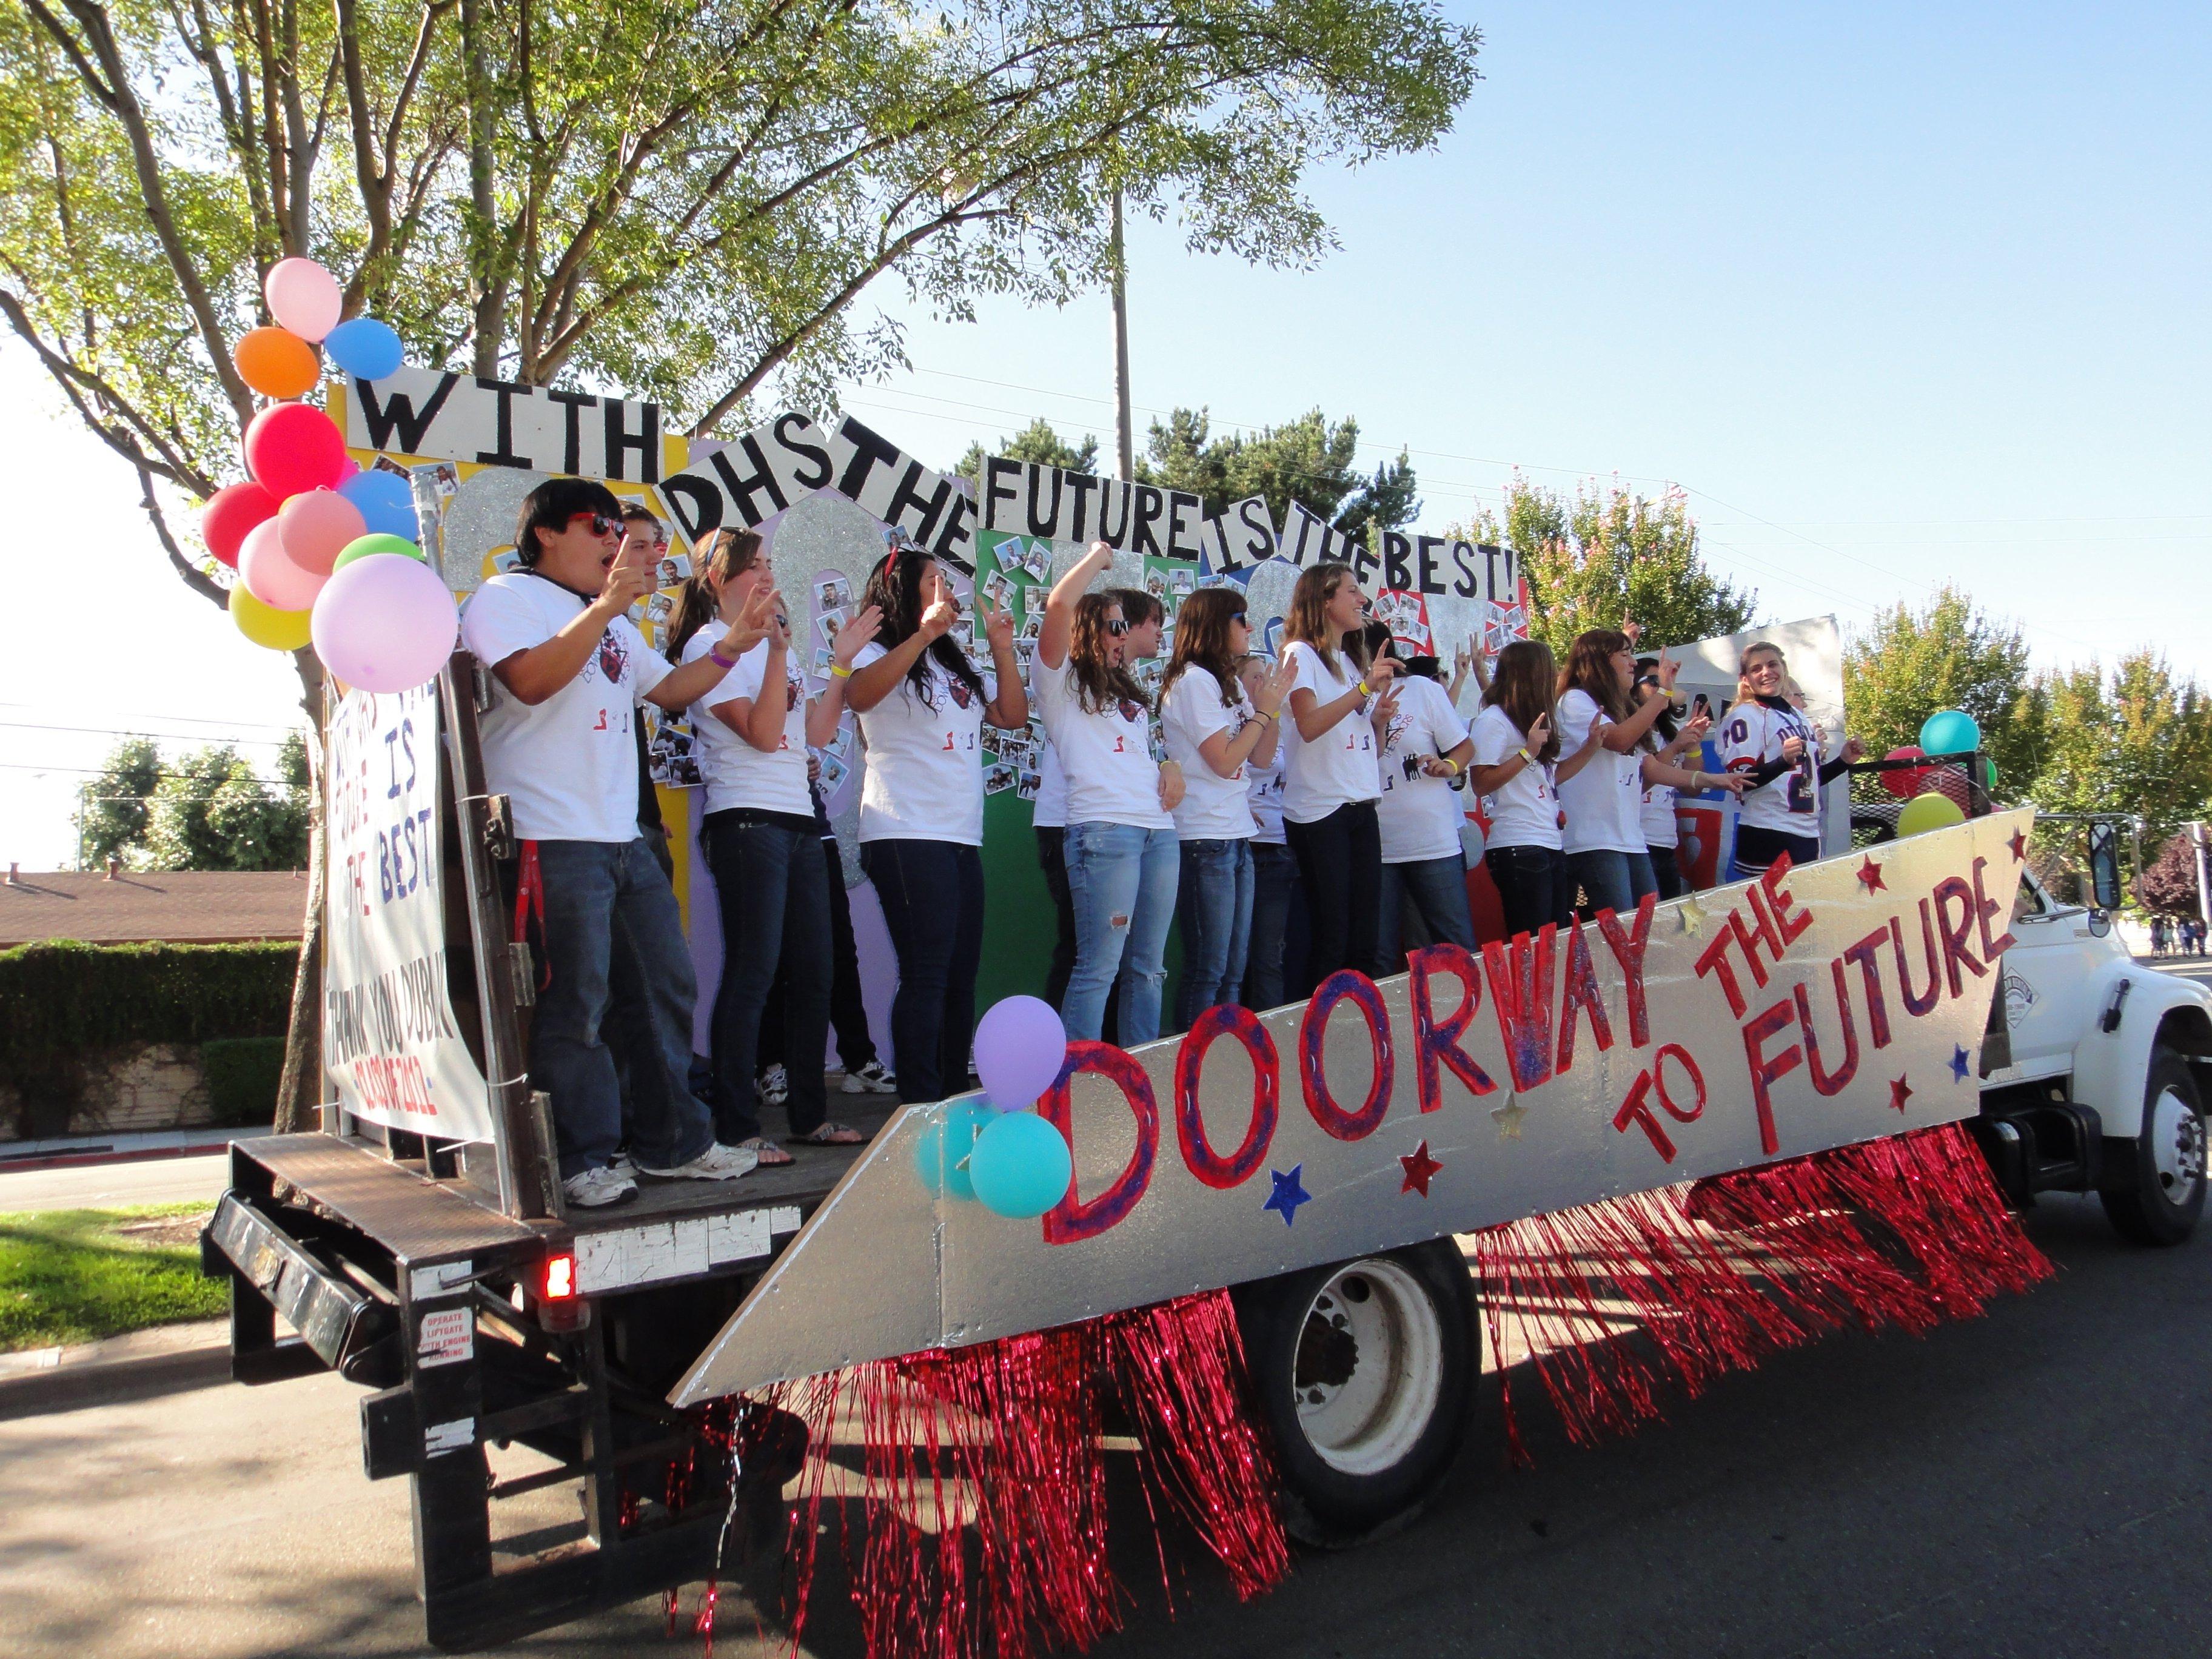 10 Best High School Homecoming Theme Ideas dublin high school homecoming 2012 schedule of events onedublin 1 2020